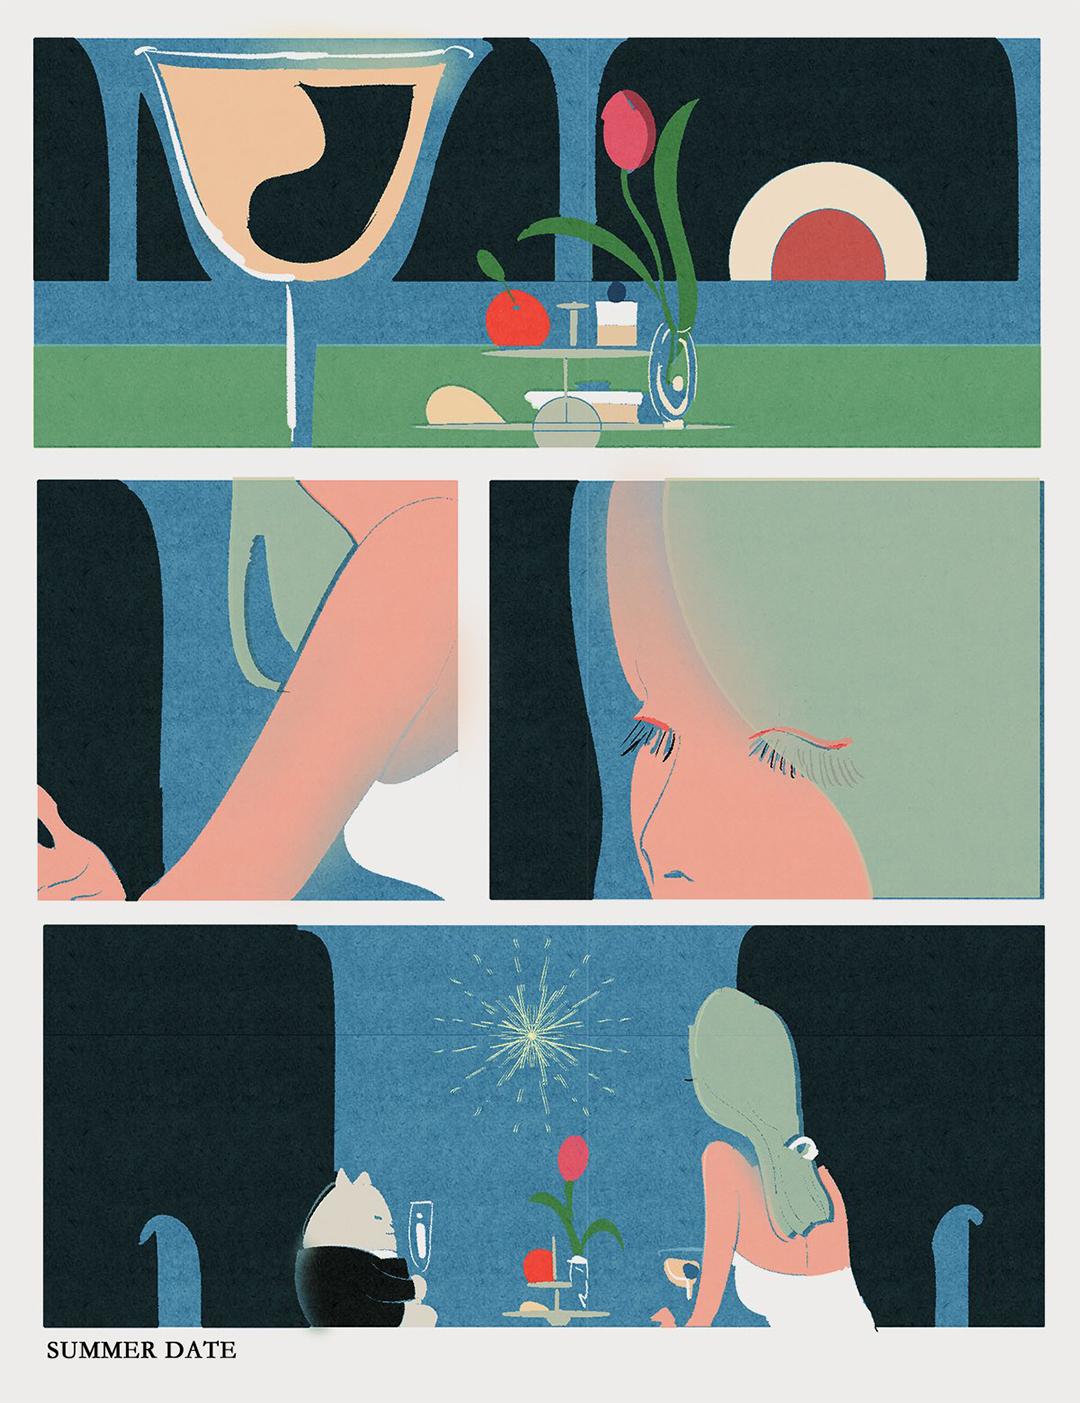 GirlsclubAsia-Illustrator-Eve Liu-File9